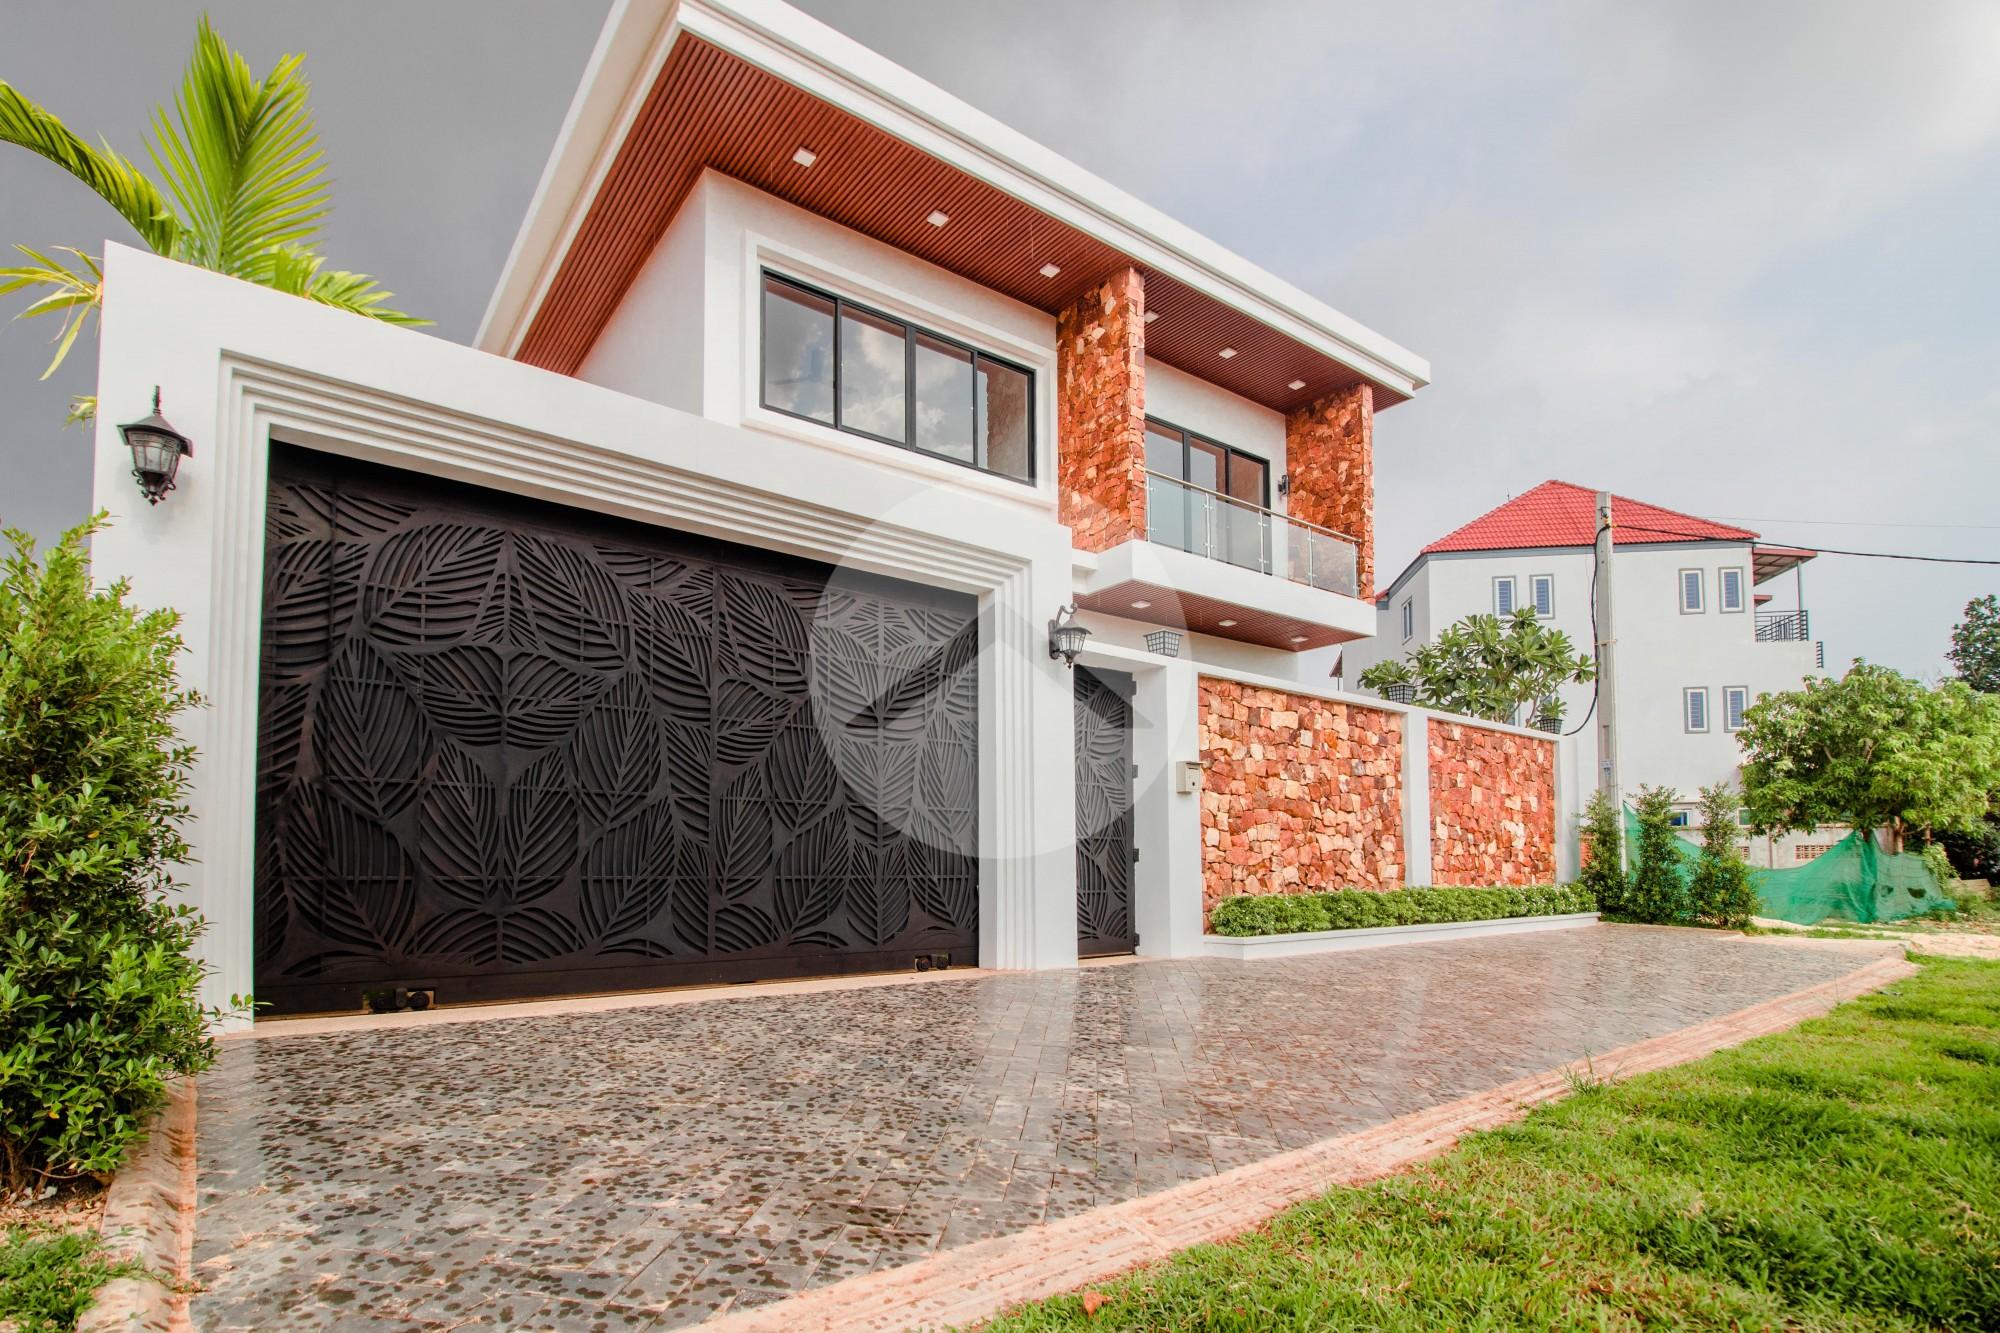 4 Bedroom Villa With Pool For Rent- Svay Dangkum, Siem Reap